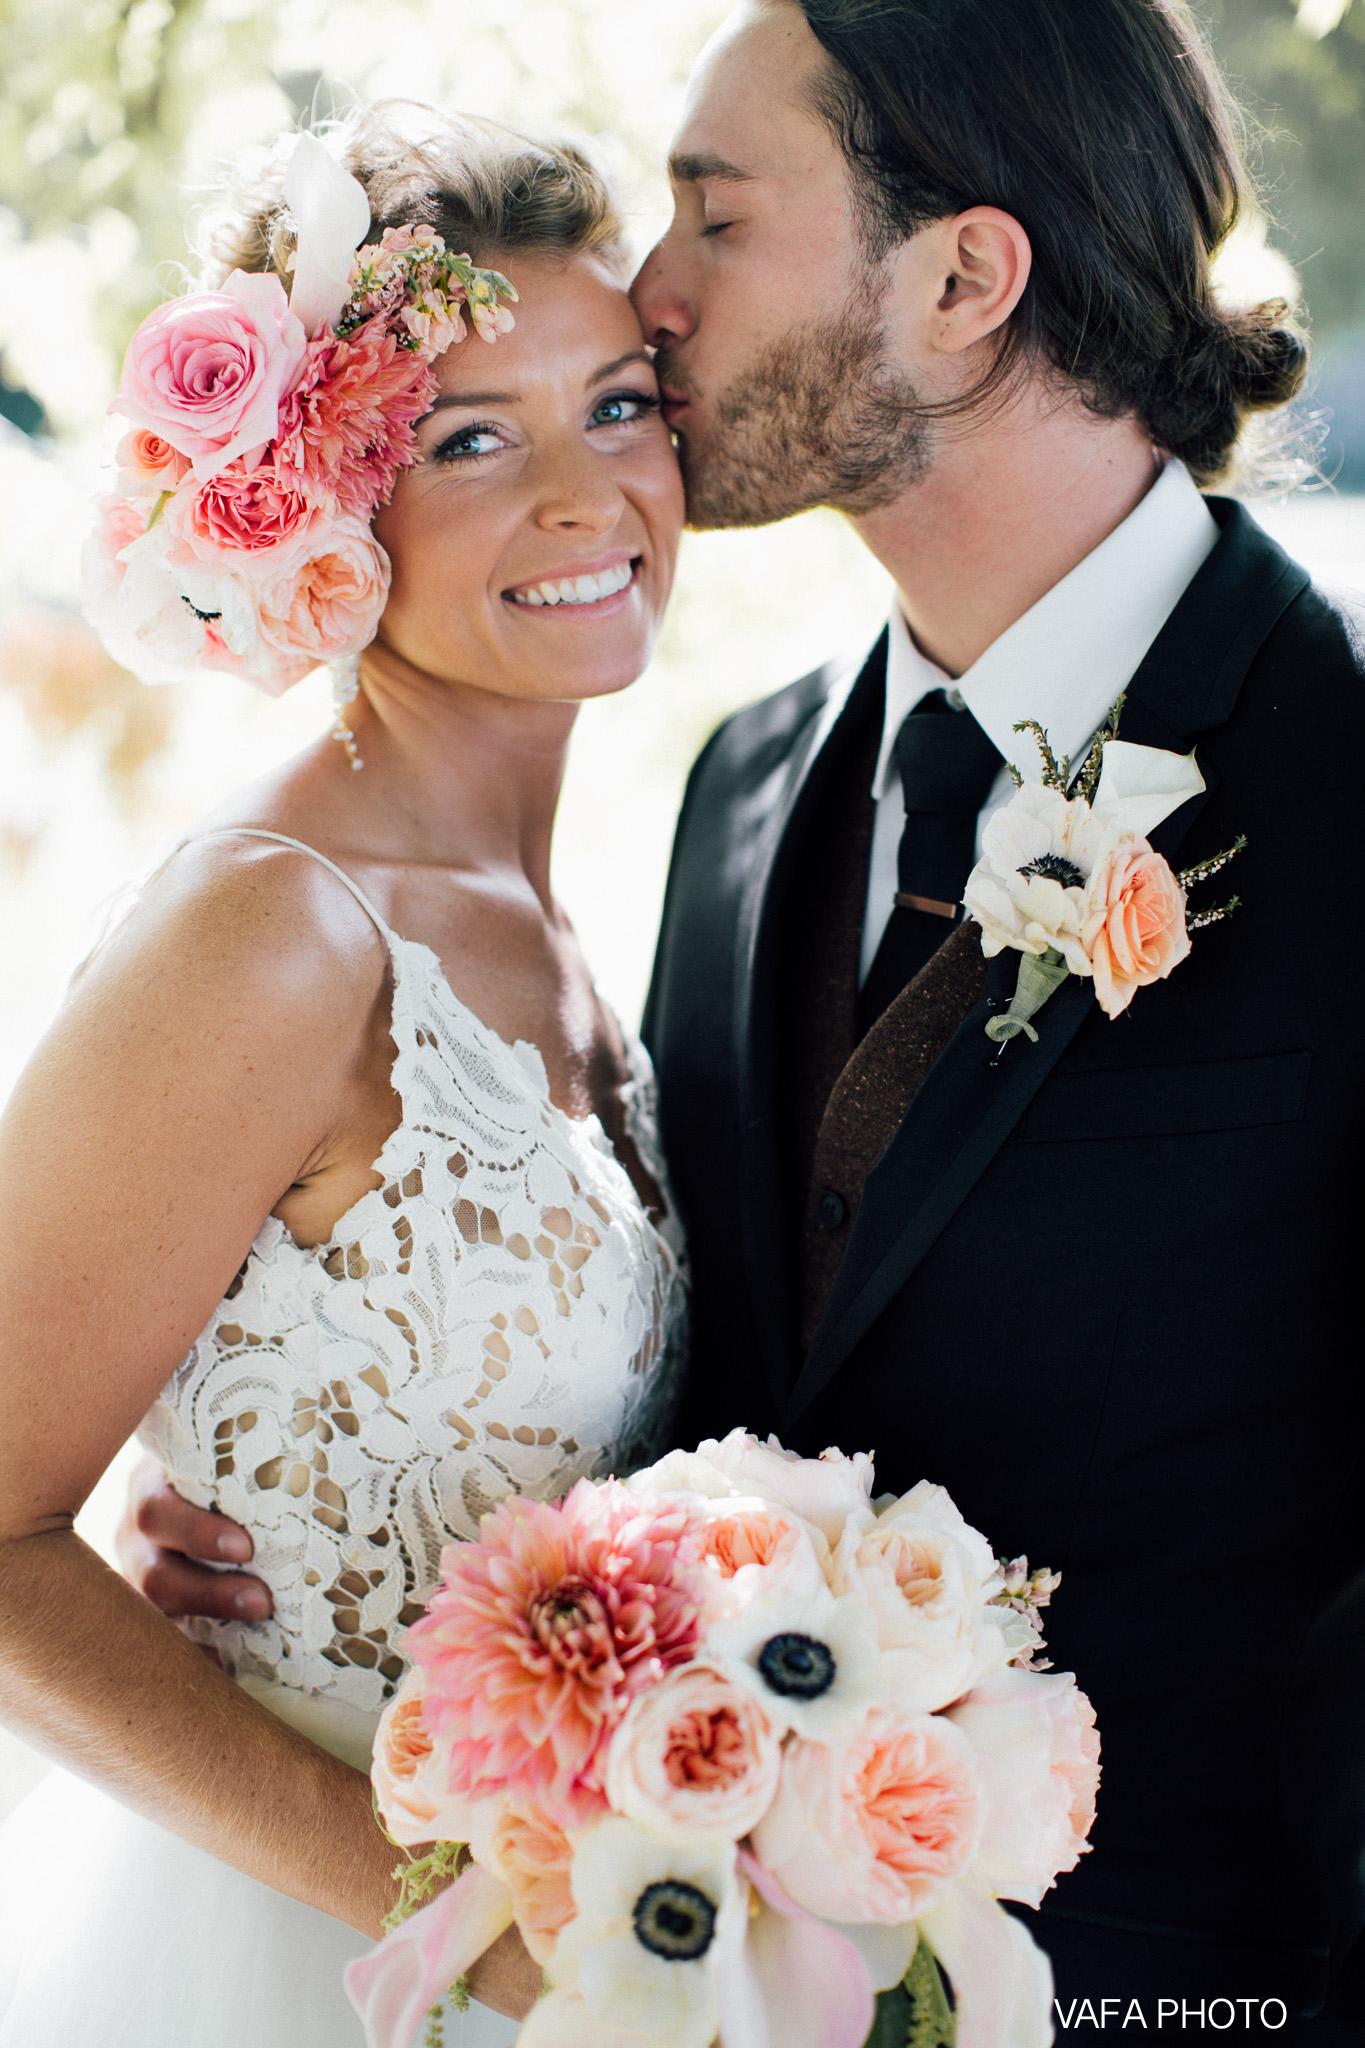 The-Felt-Estate-Wedding-Kailie-David-Vafa-Photo-579.jpg